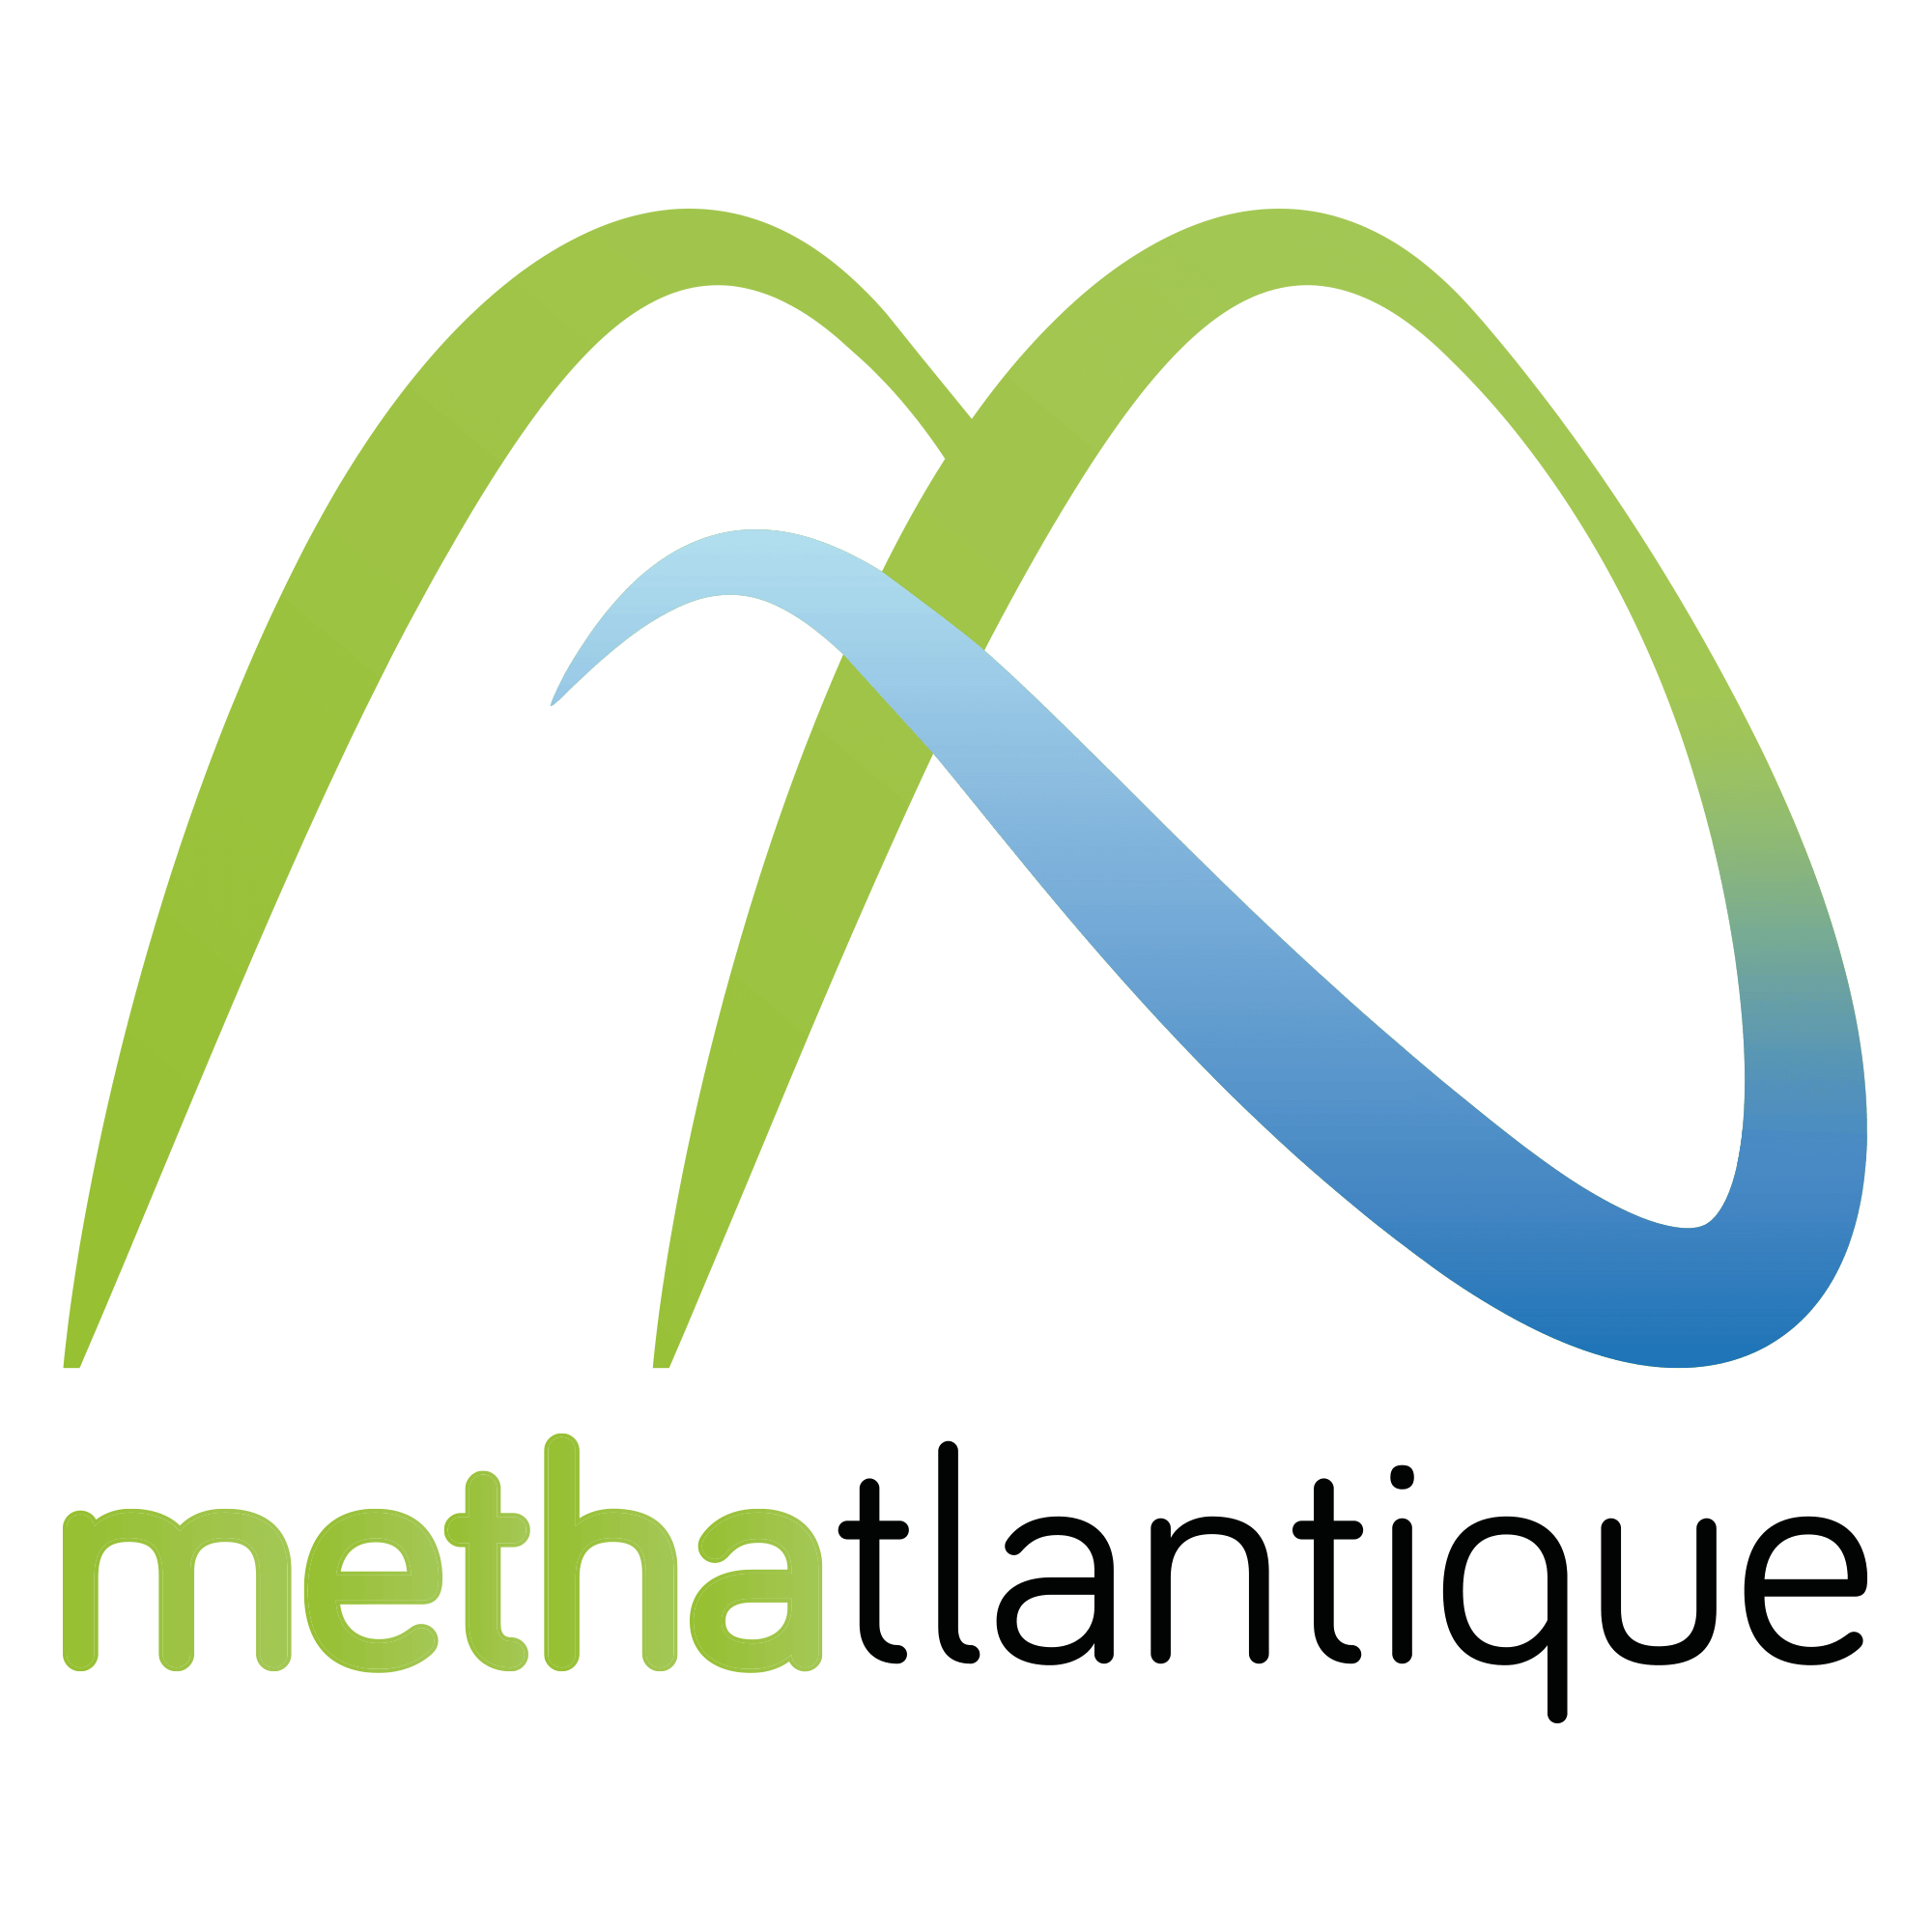 logo methaatlantique atlantique industrie